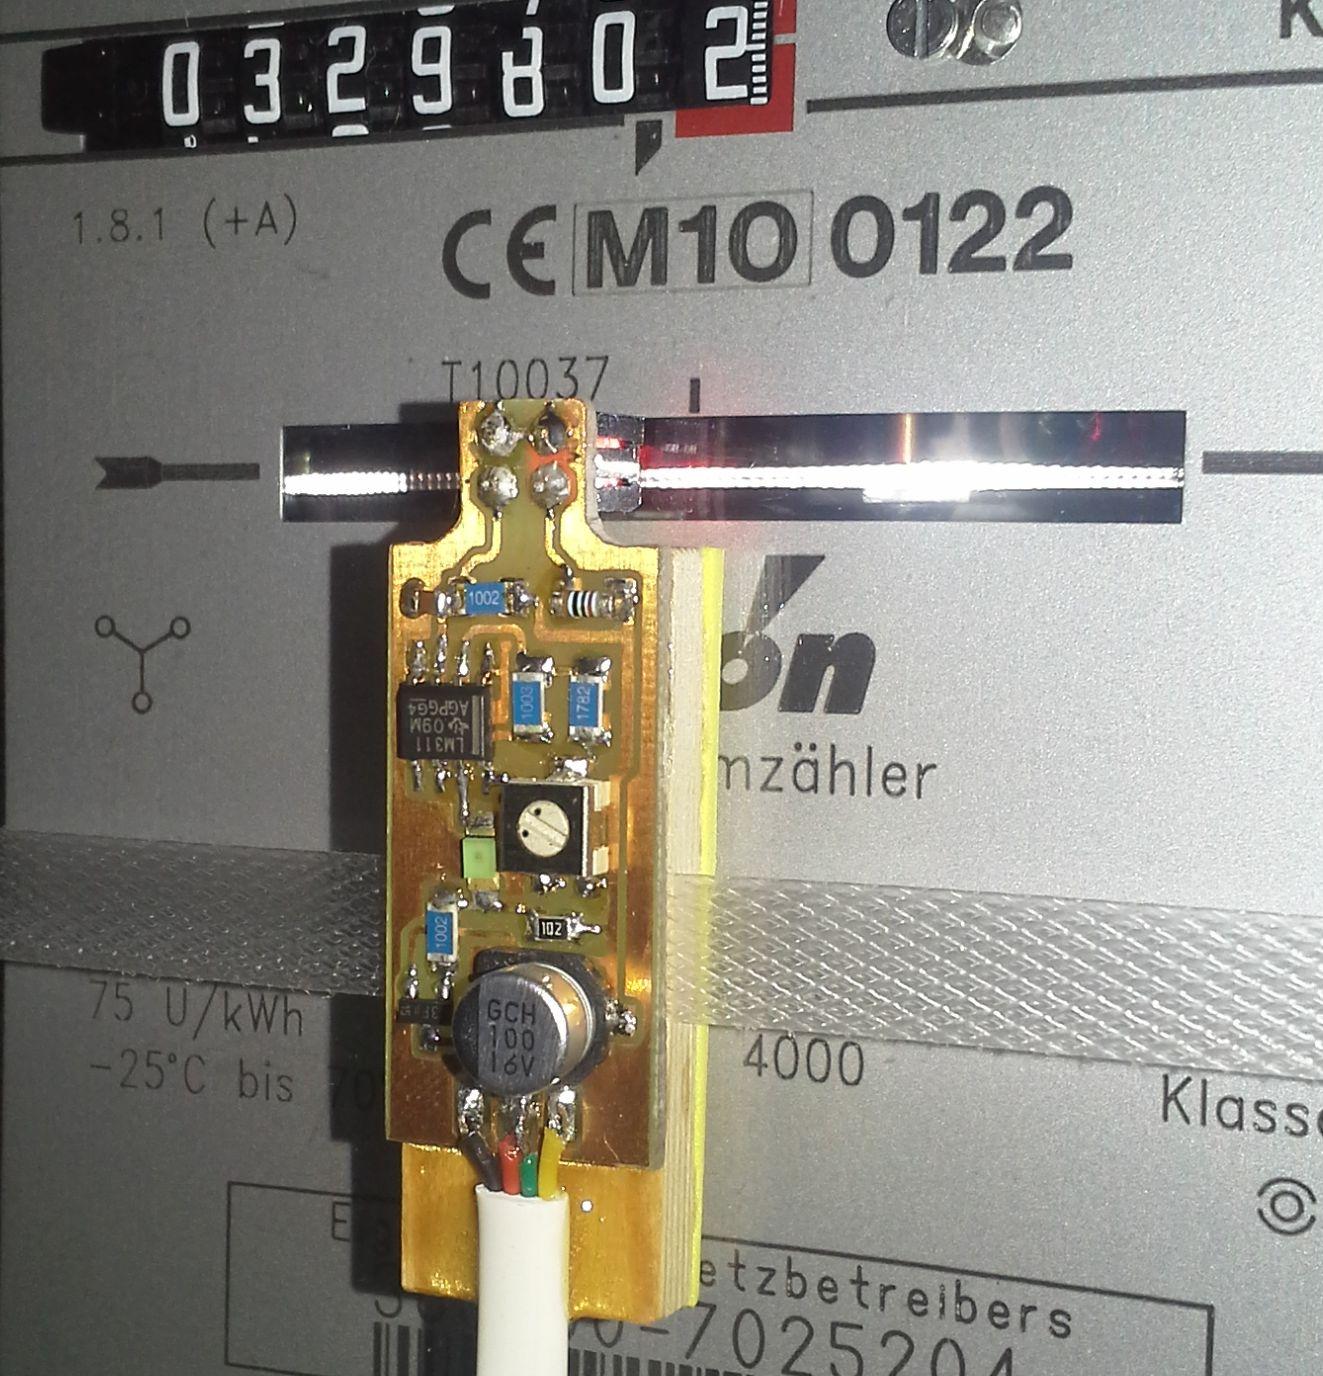 Fabulous RaspPi: Datenlogger für (analoge) Stromzähler - Mikrocontroller.net JW64